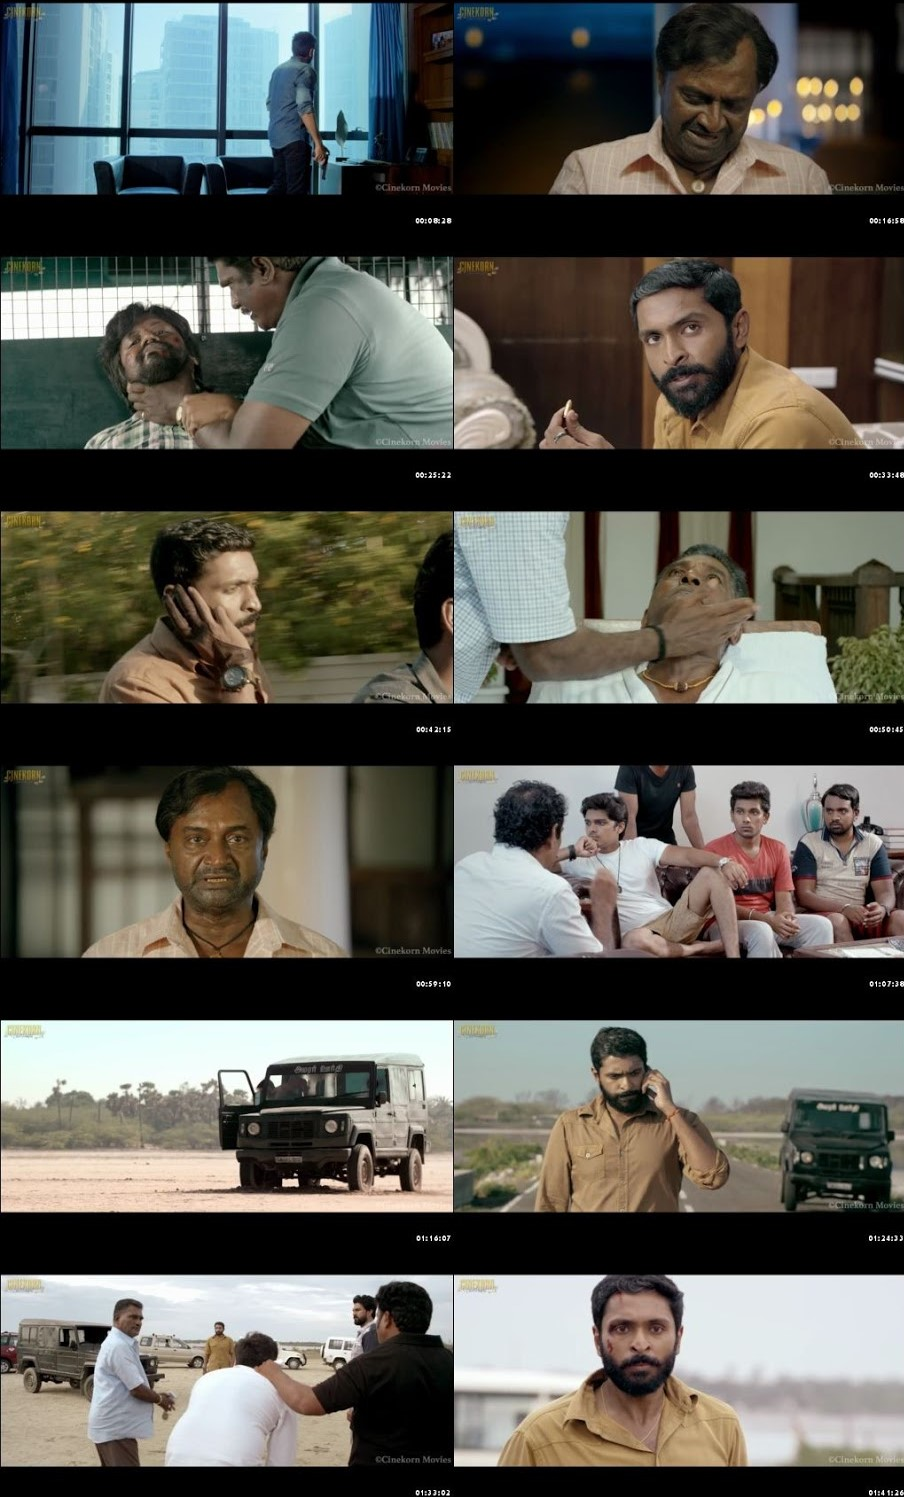 Thuppaki Munai 2018 Hindi Dubbed Movie Download HDRip 720p